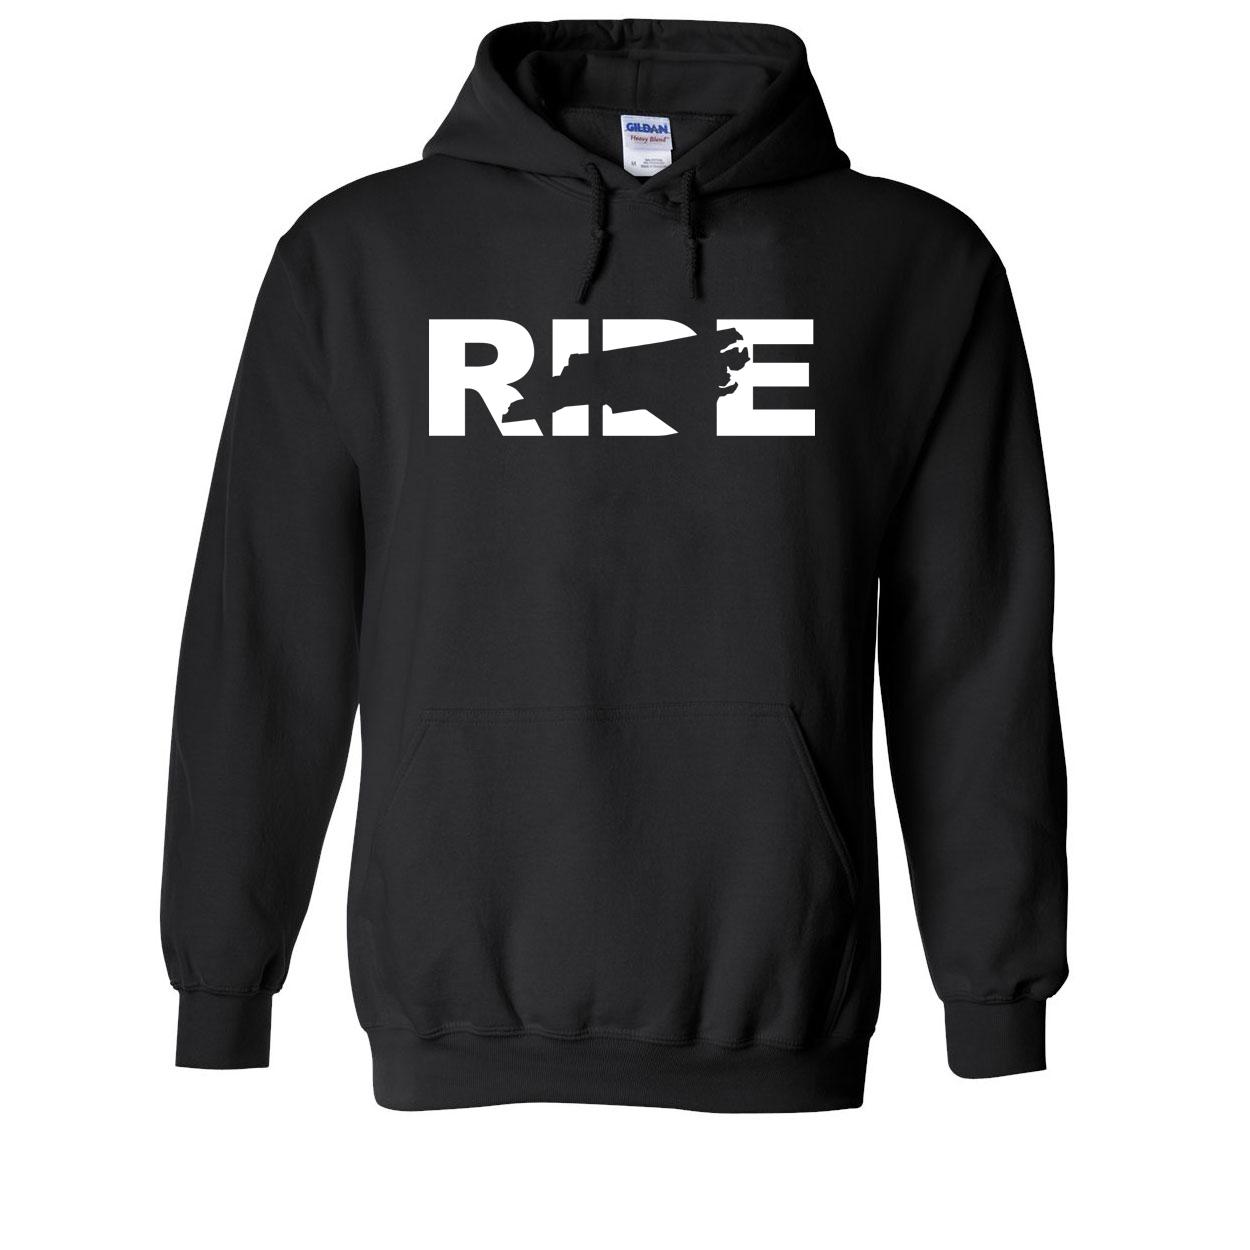 Ride North Carolina Classic Sweatshirt Black (White Logo)